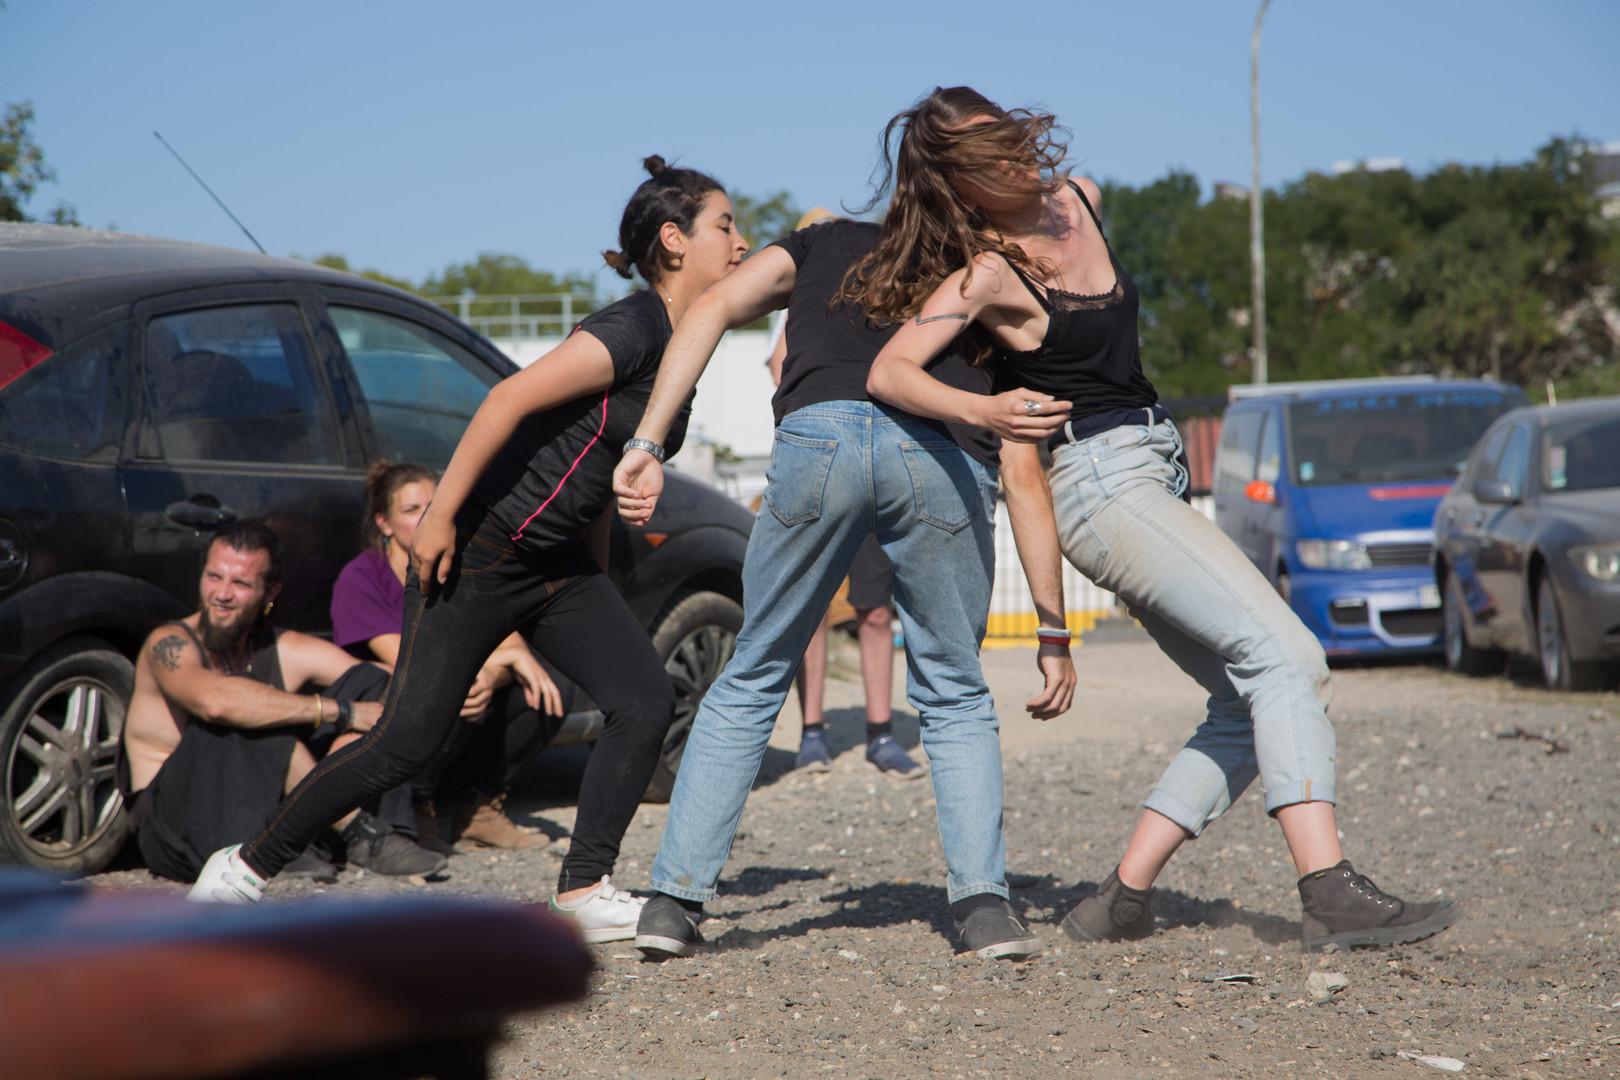 Our events ©LudovicaAnzaldi